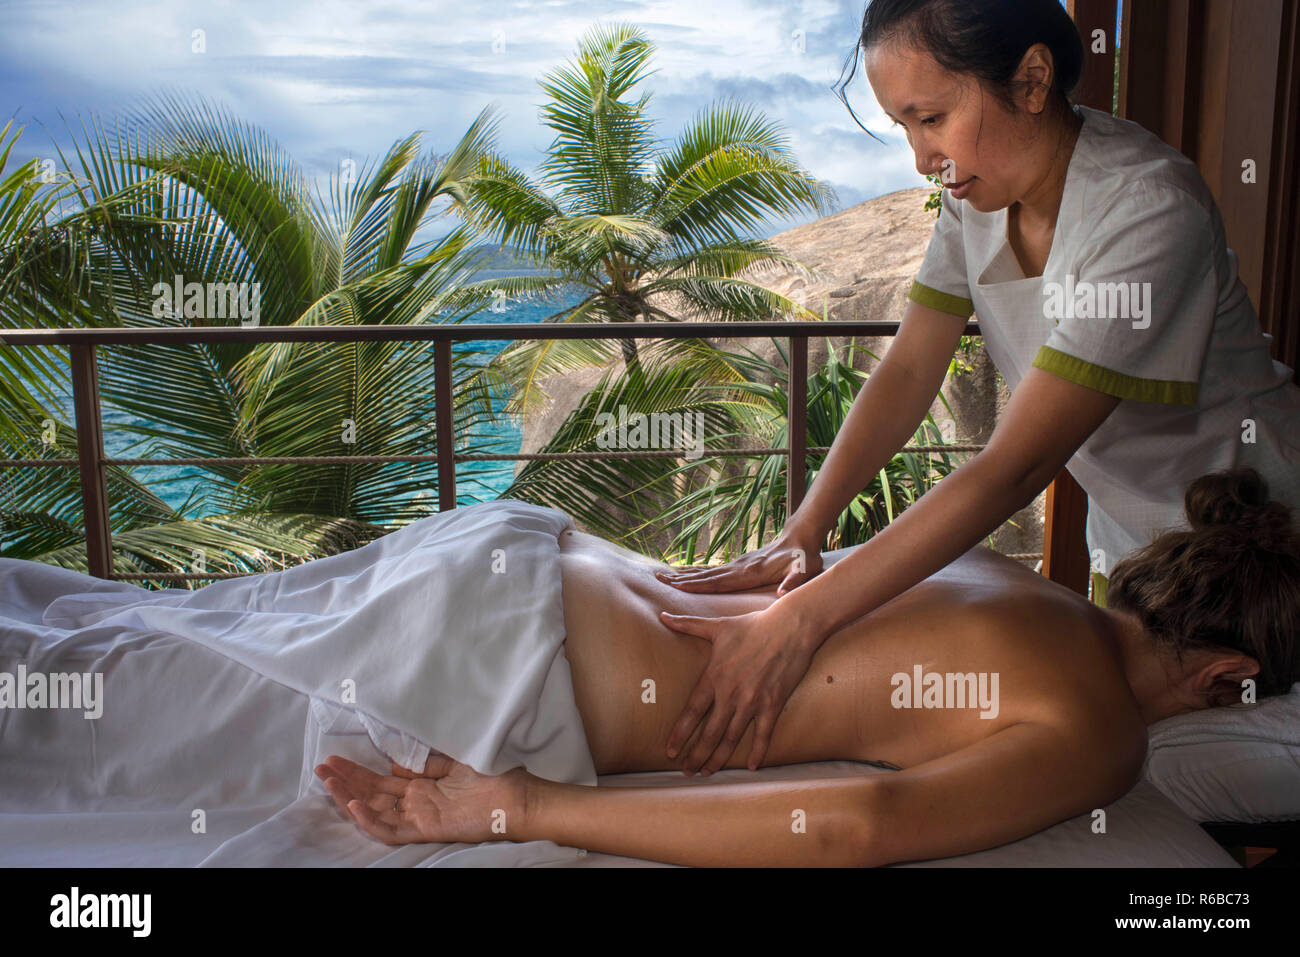 Relaxing massage in Six Senses Zil Pasyon luxury hotel. Felicite island Seychelles. - Stock Image